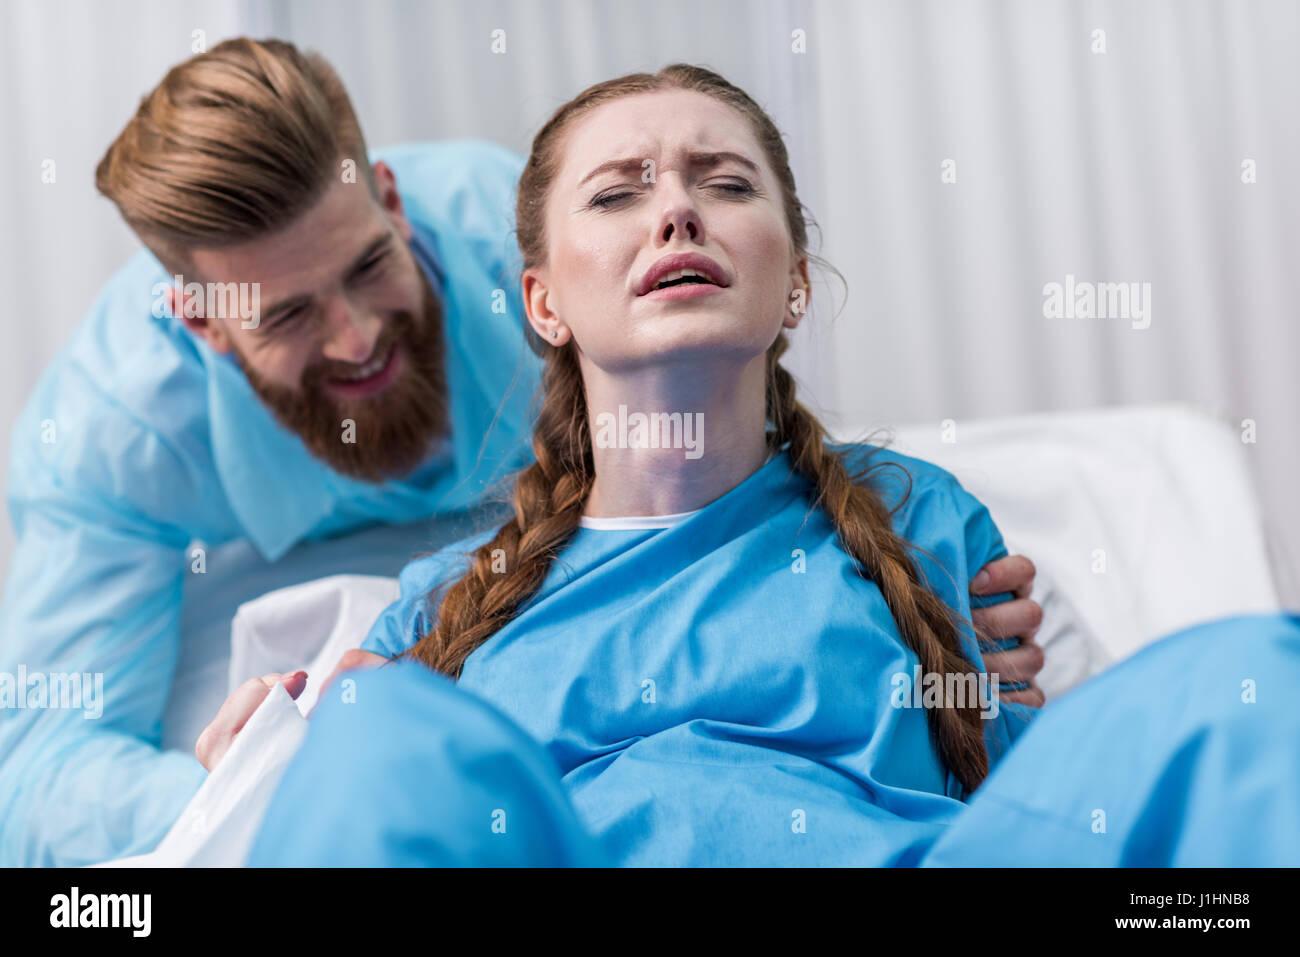 Pregnant woman giving birth